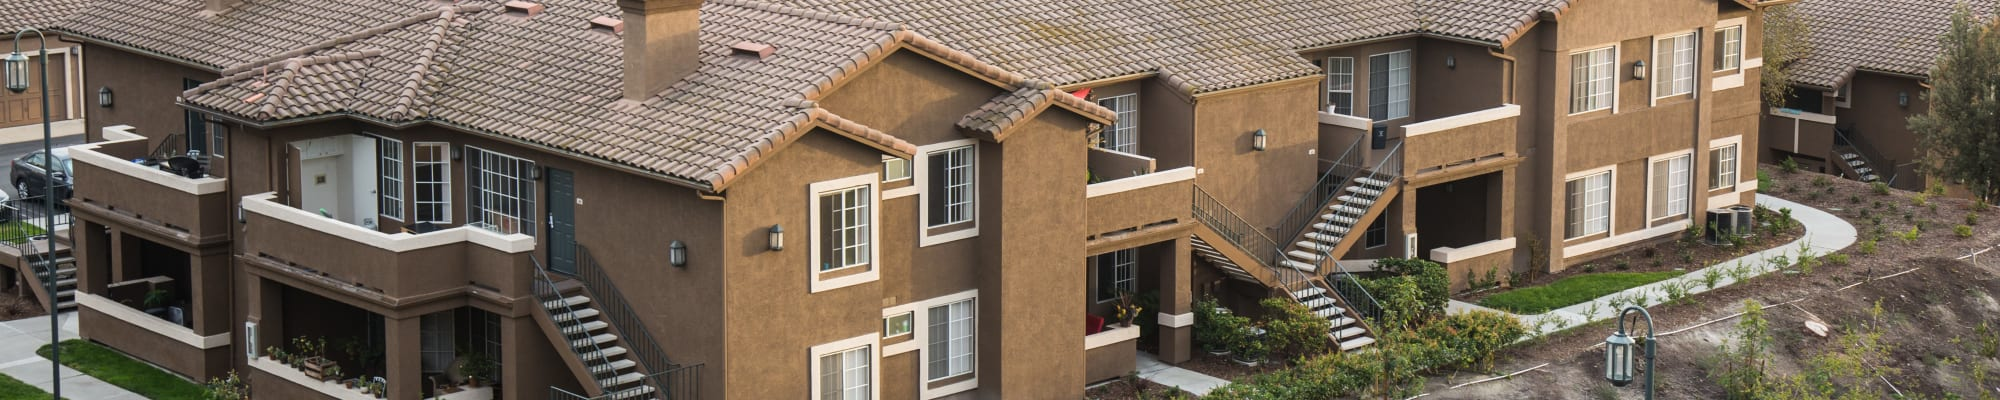 Community map at Paloma Summit Condominium Rentals in Foothill Ranch, California